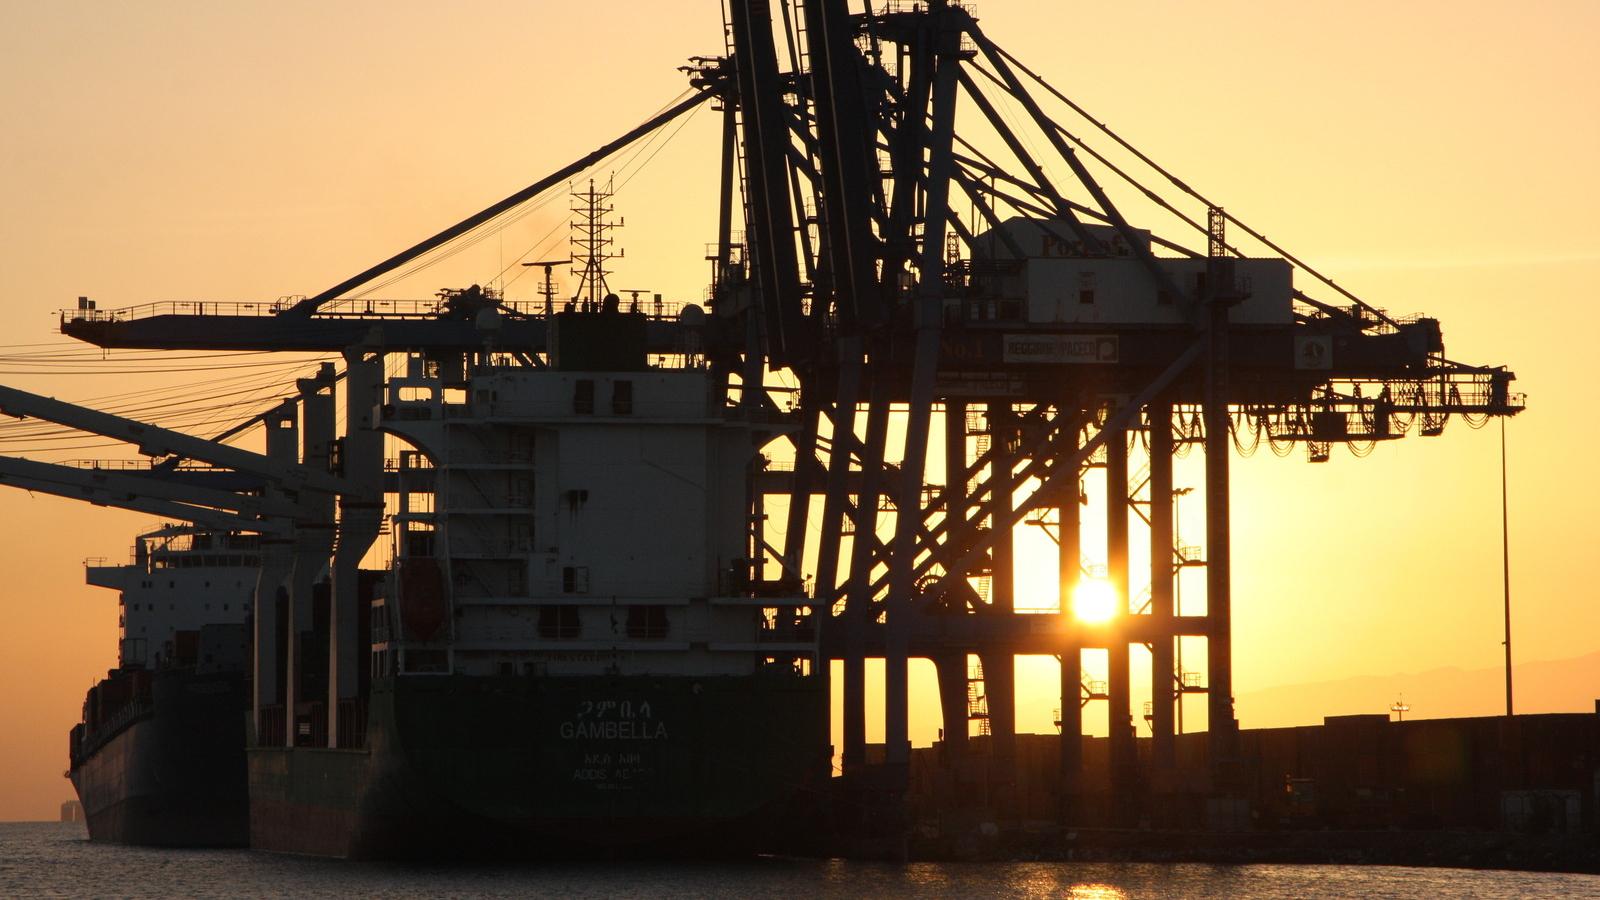 Djibouti City port, sundown.